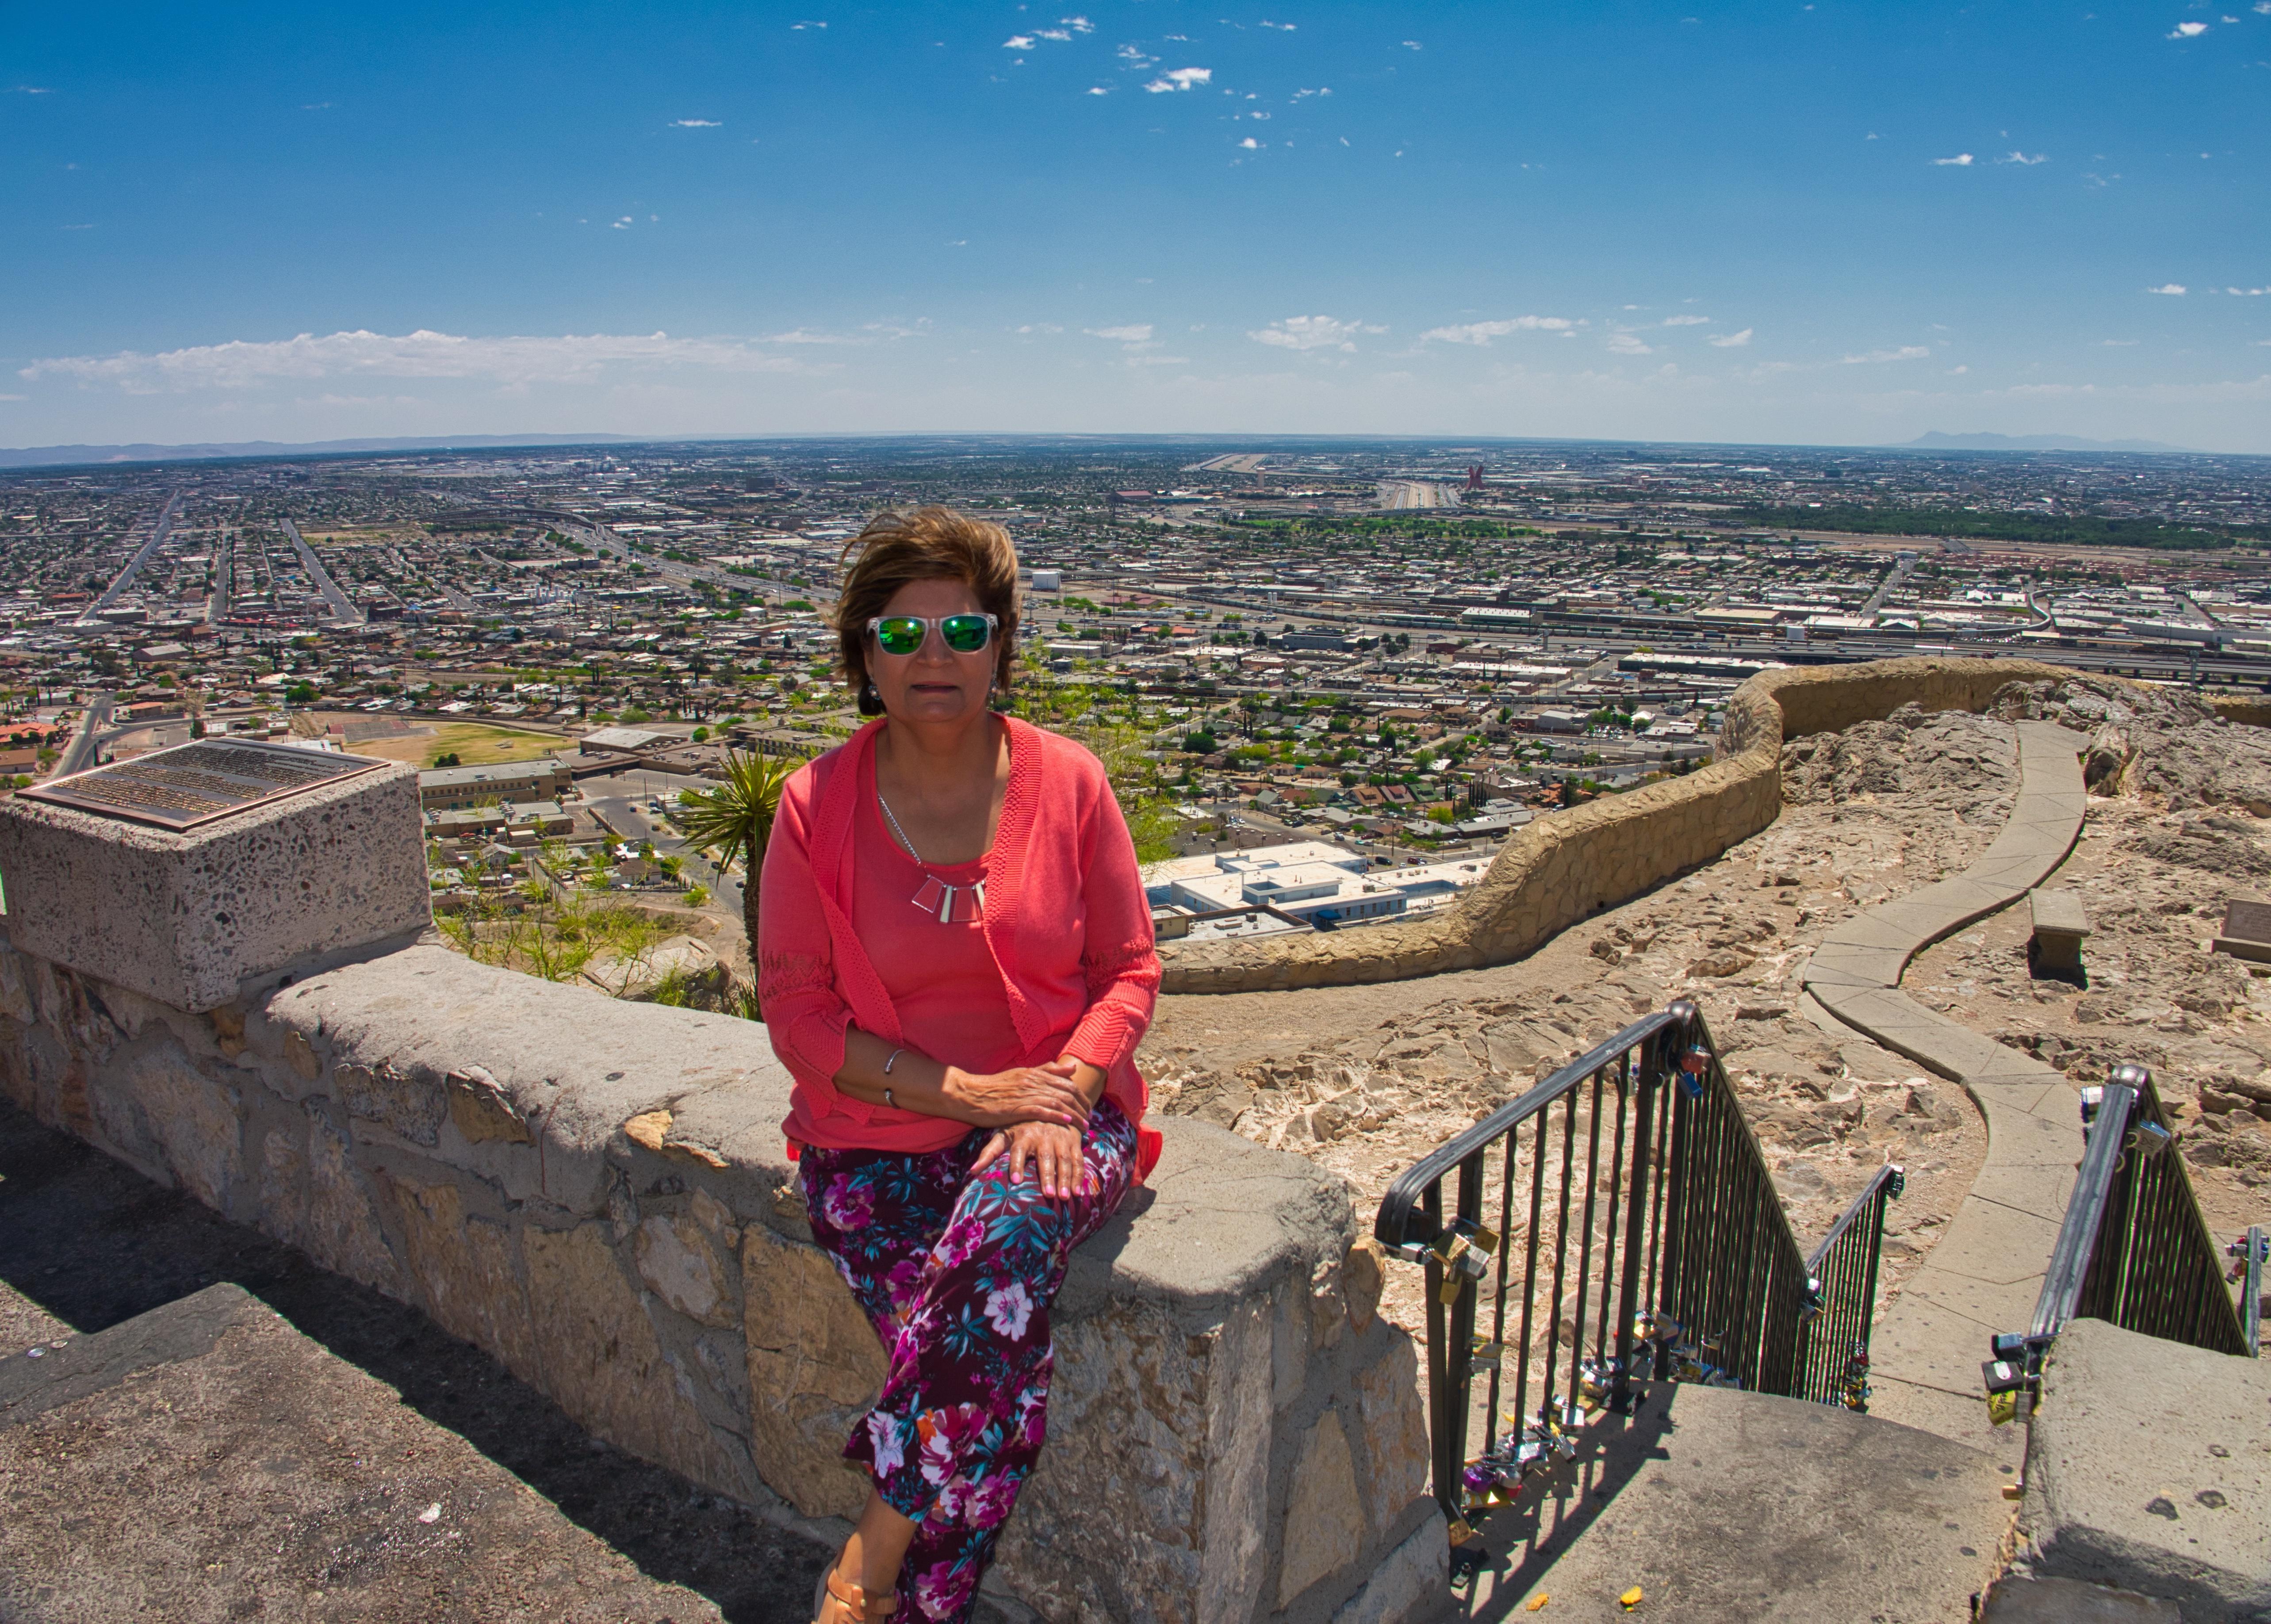 View of El Paso and Juarez further away.